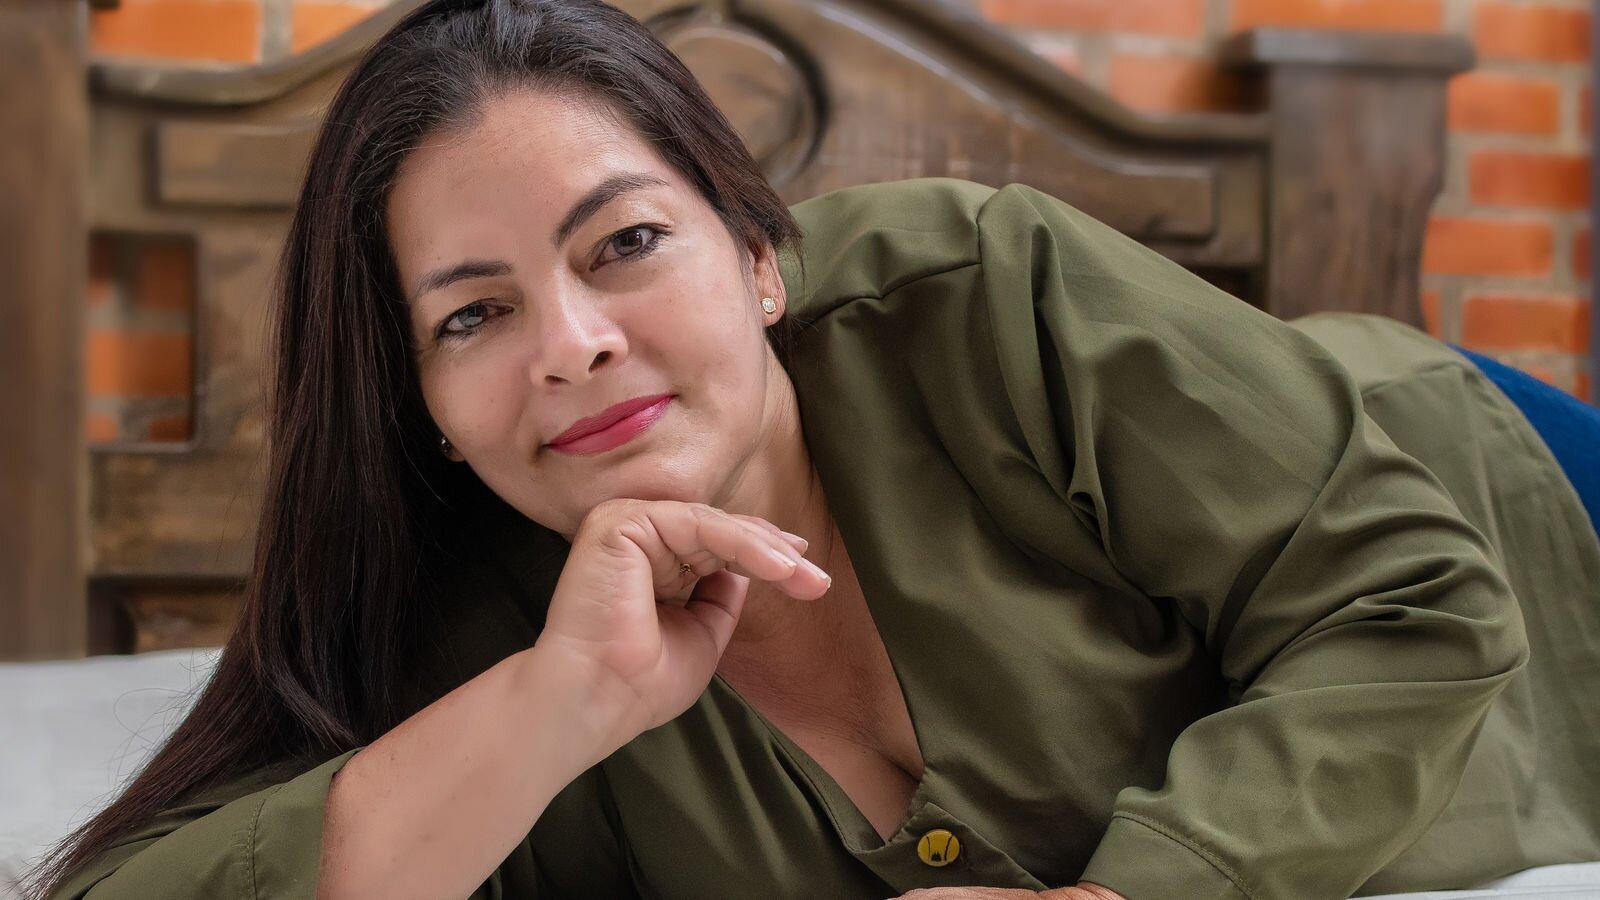 CarolinaMerchan